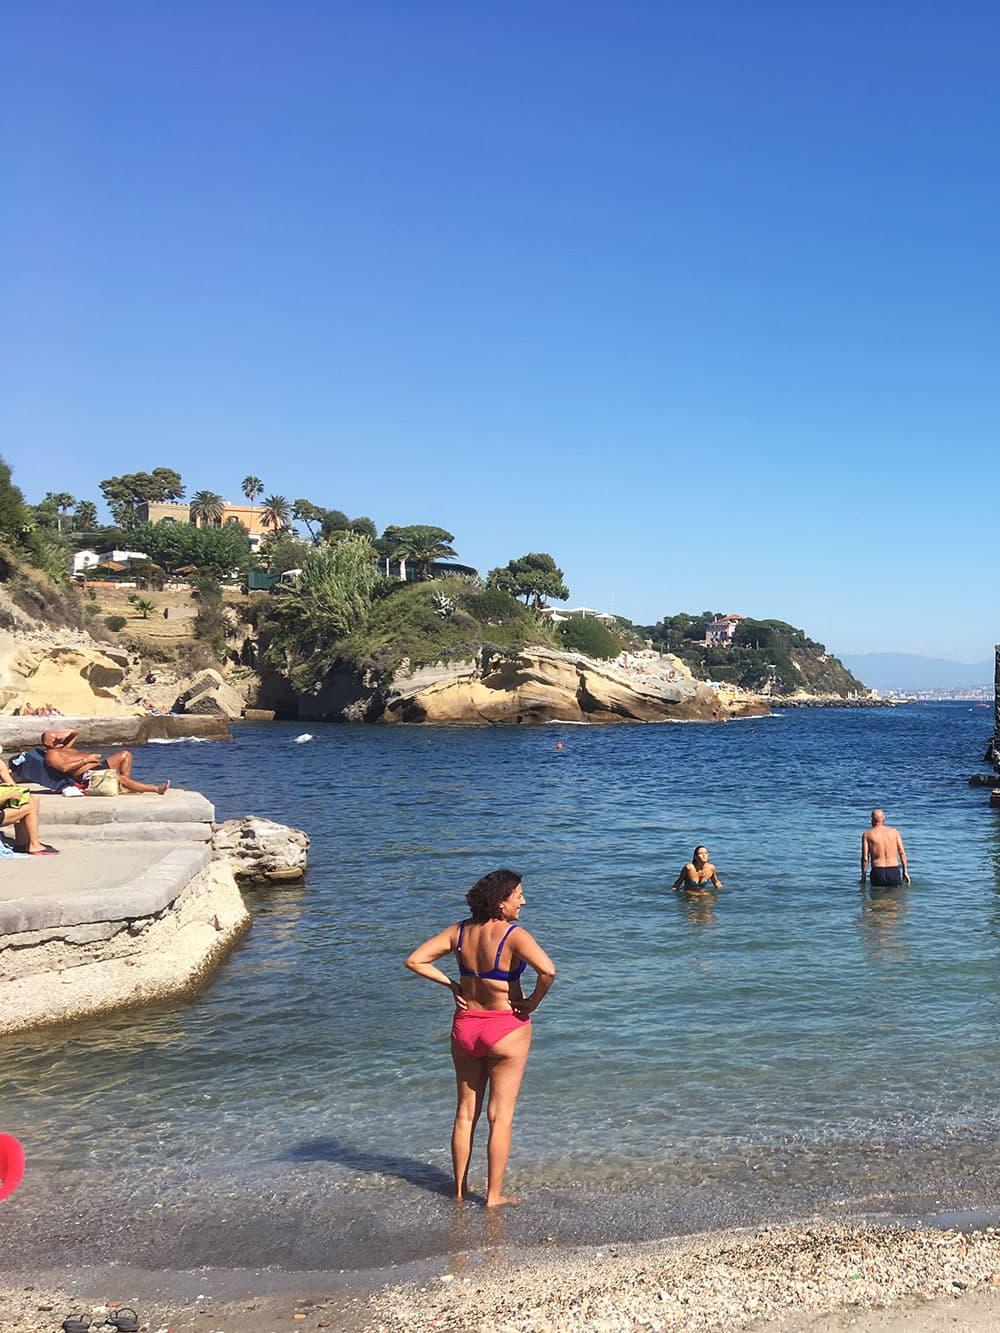 Gaiola beach is a secret hotspot with locals